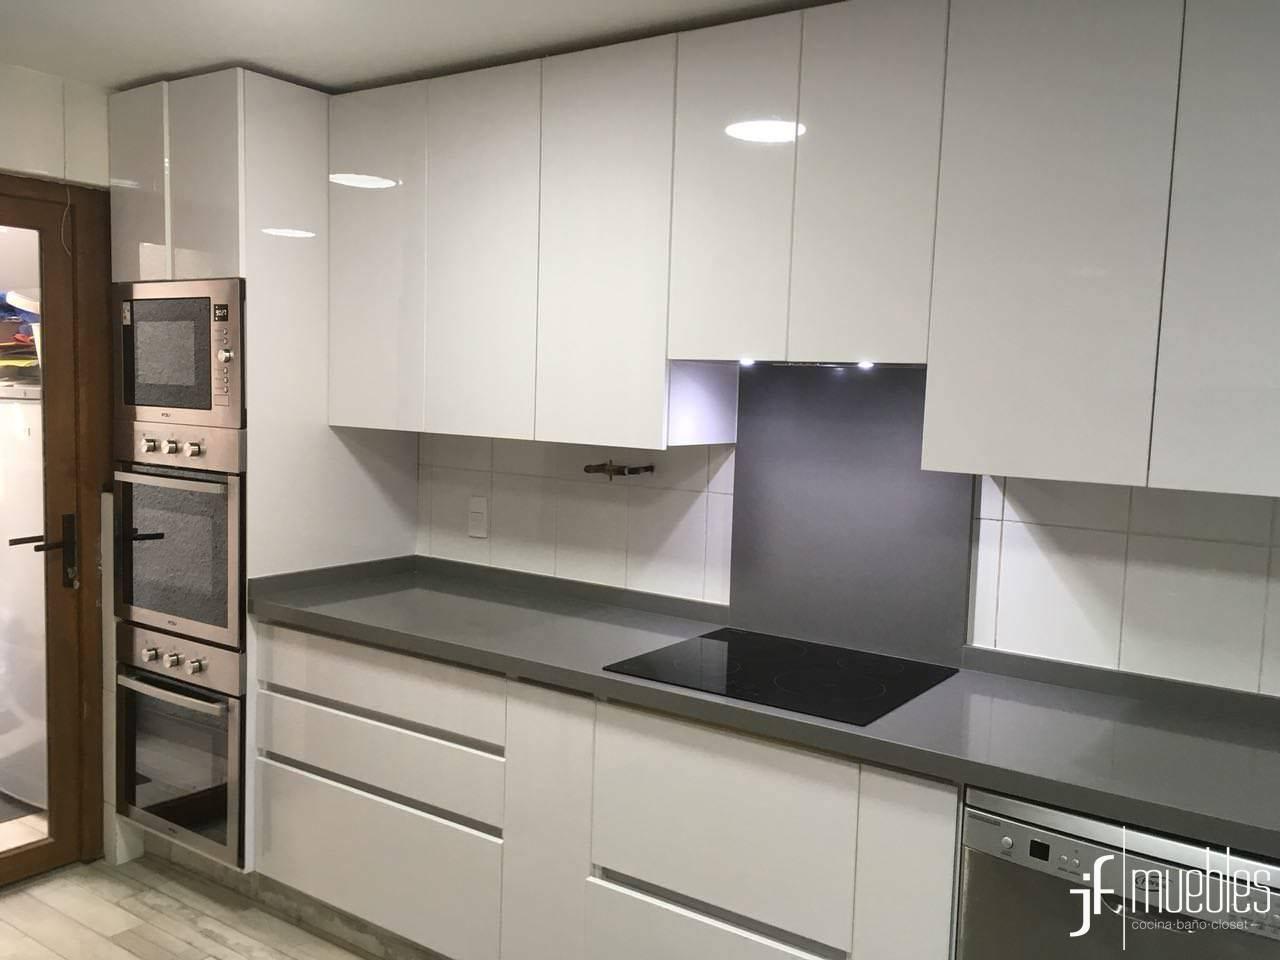 Jf muebles muebles de cocina walk in closet muebles a for Precios muebles de cocina a medida